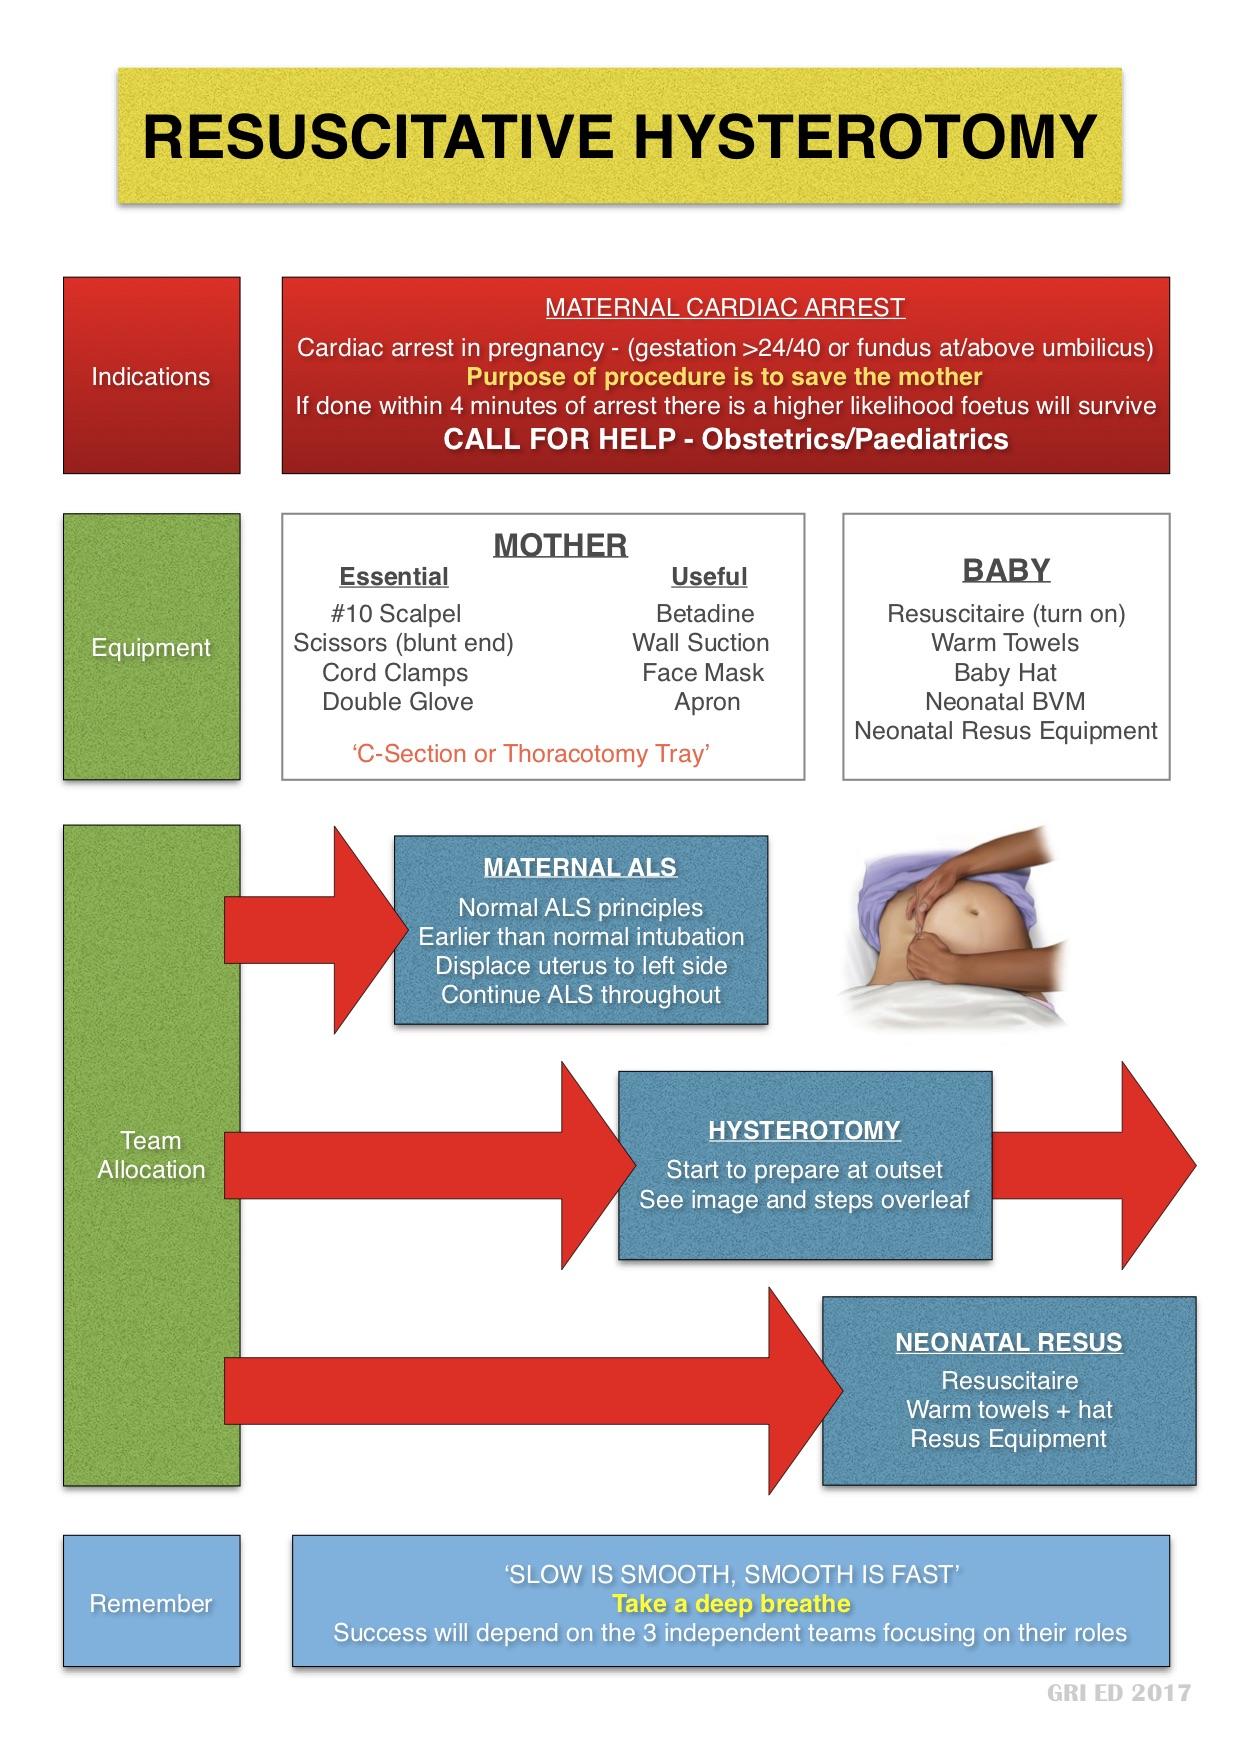 Resuscitative Hysterotomy1.jpg